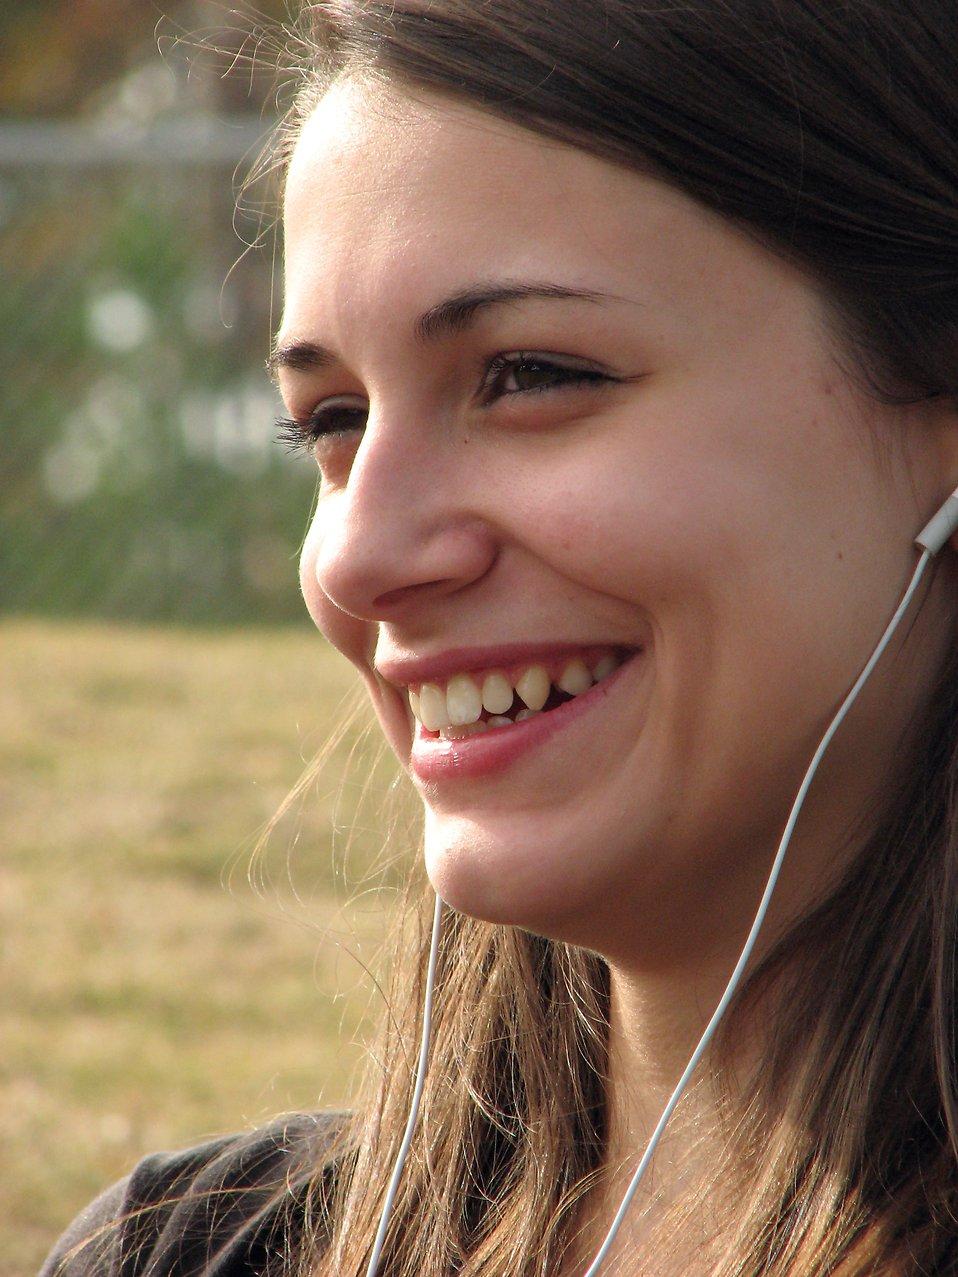 Teenage girl listening to music : Free Stock Photo